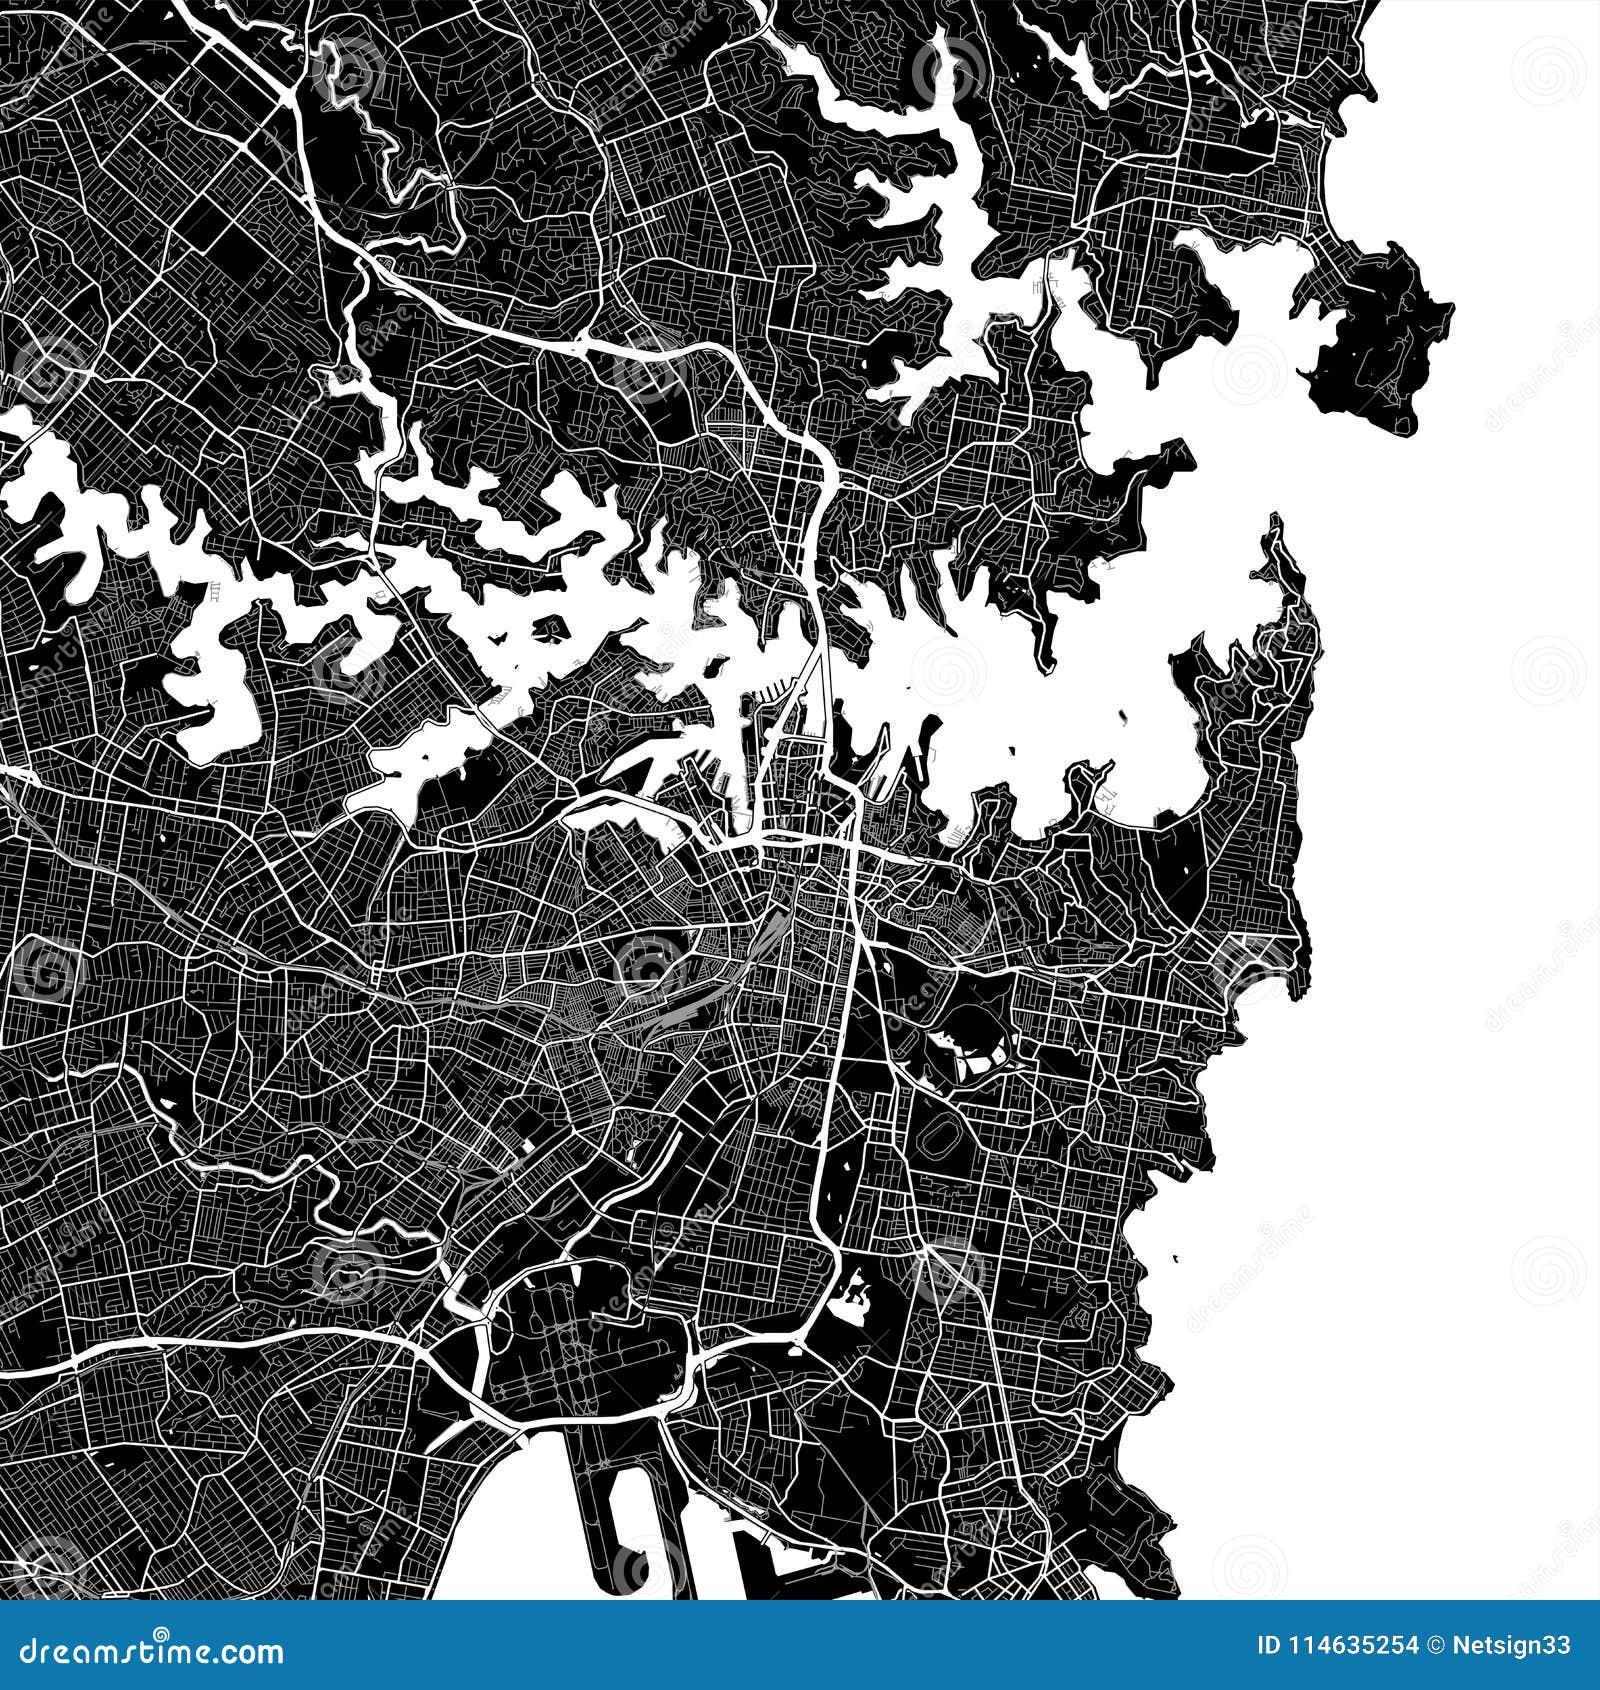 Area map of Sydney, Australia